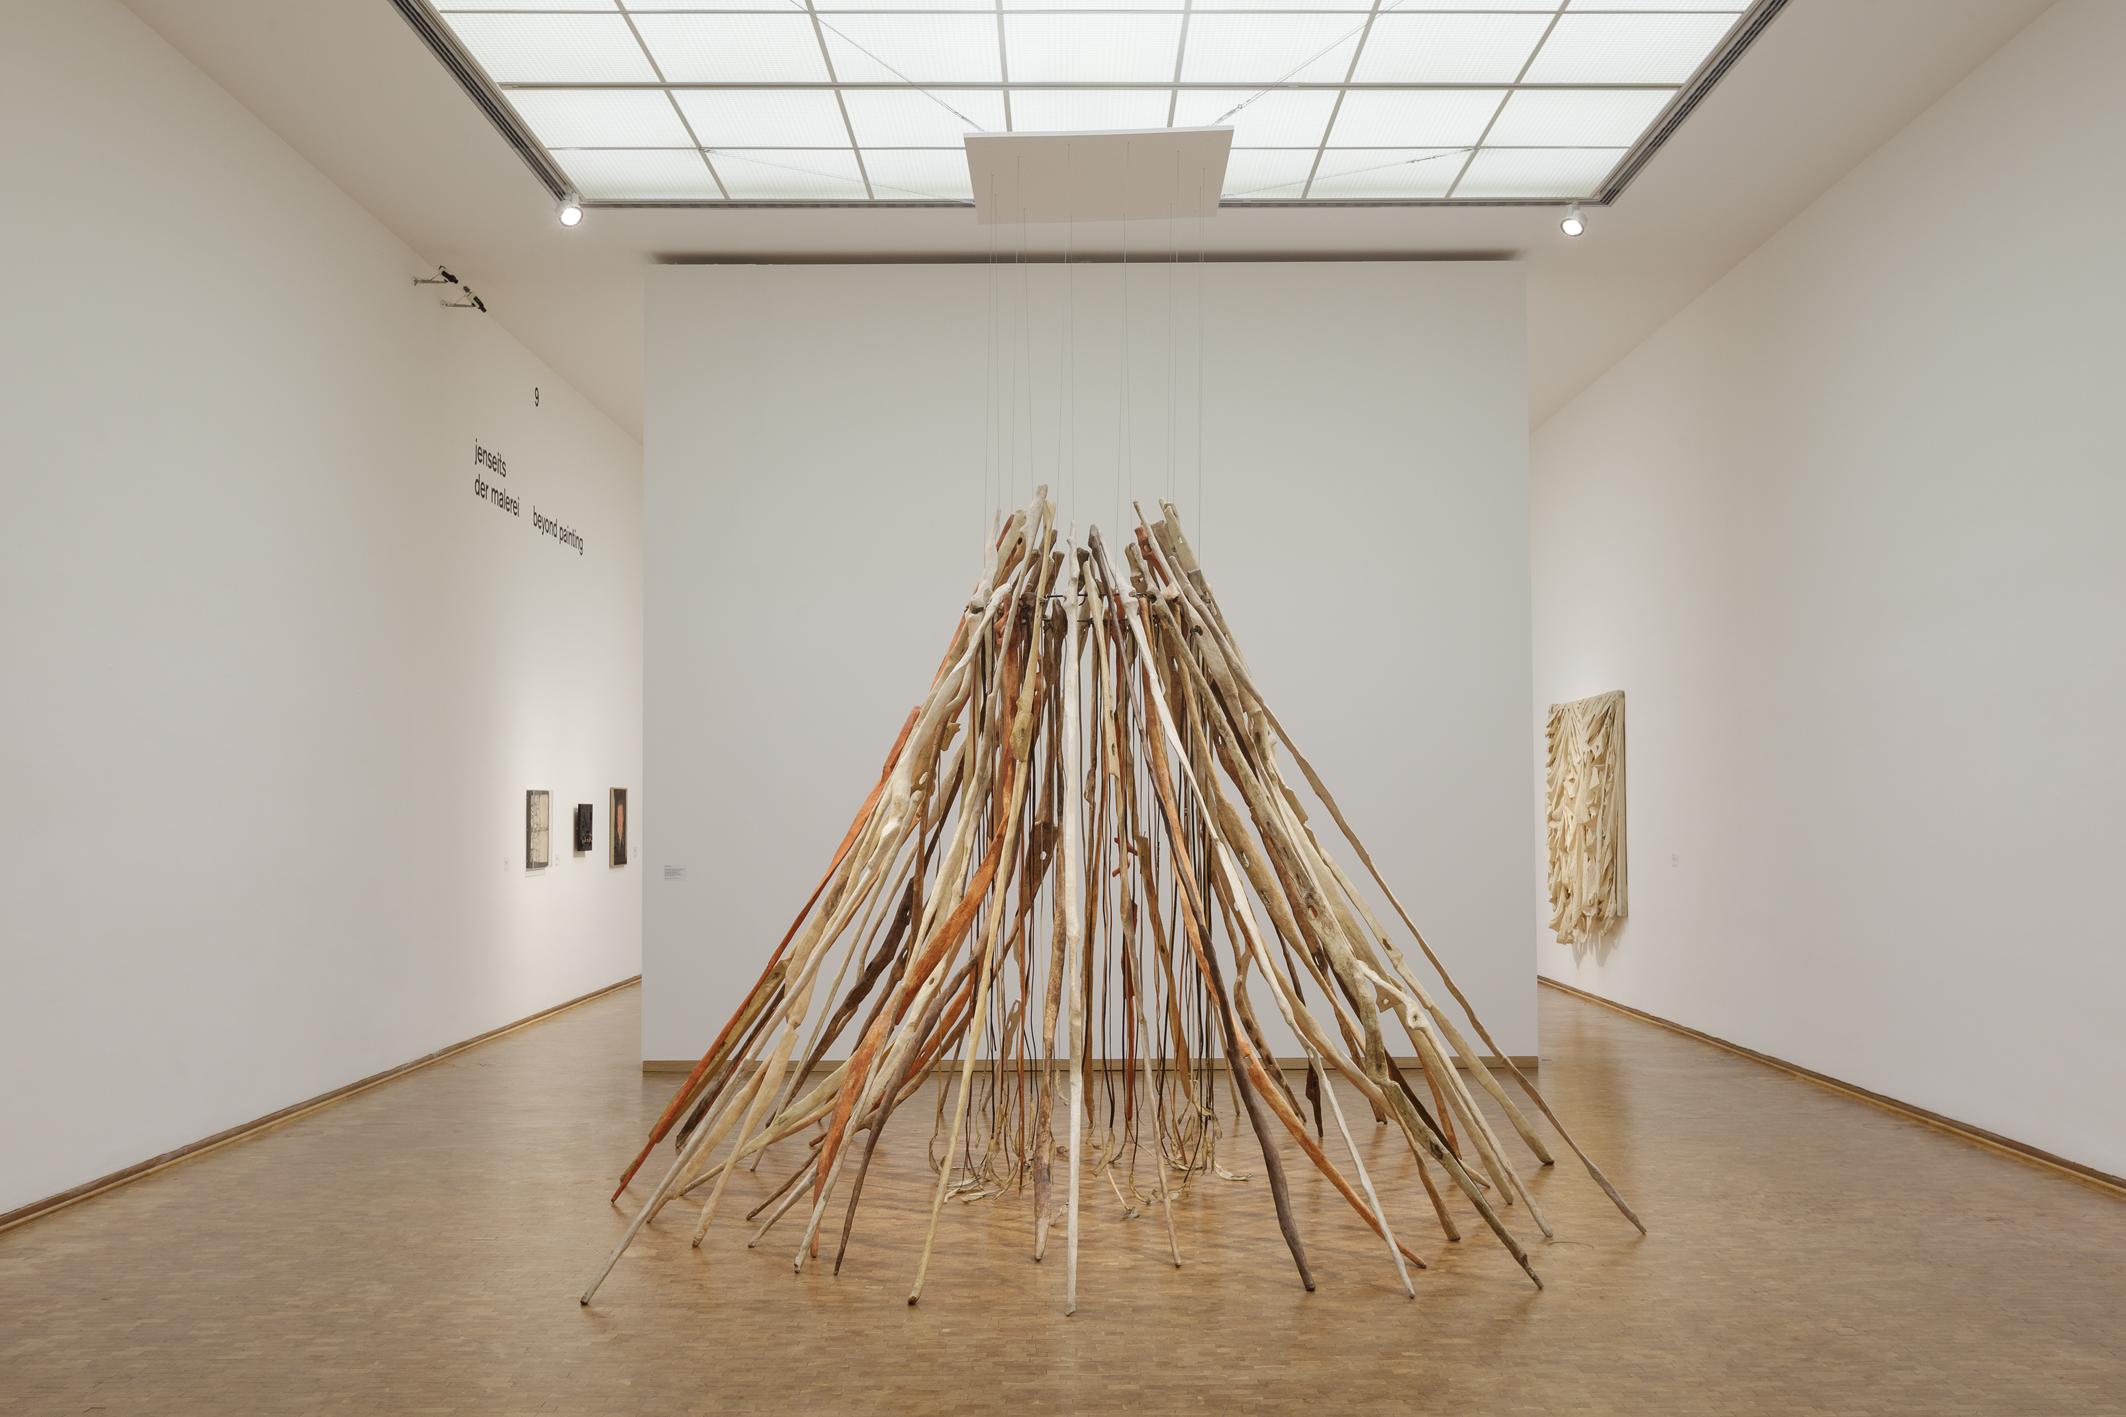 Wolfgang Hahn Kunst Ins Leben 02